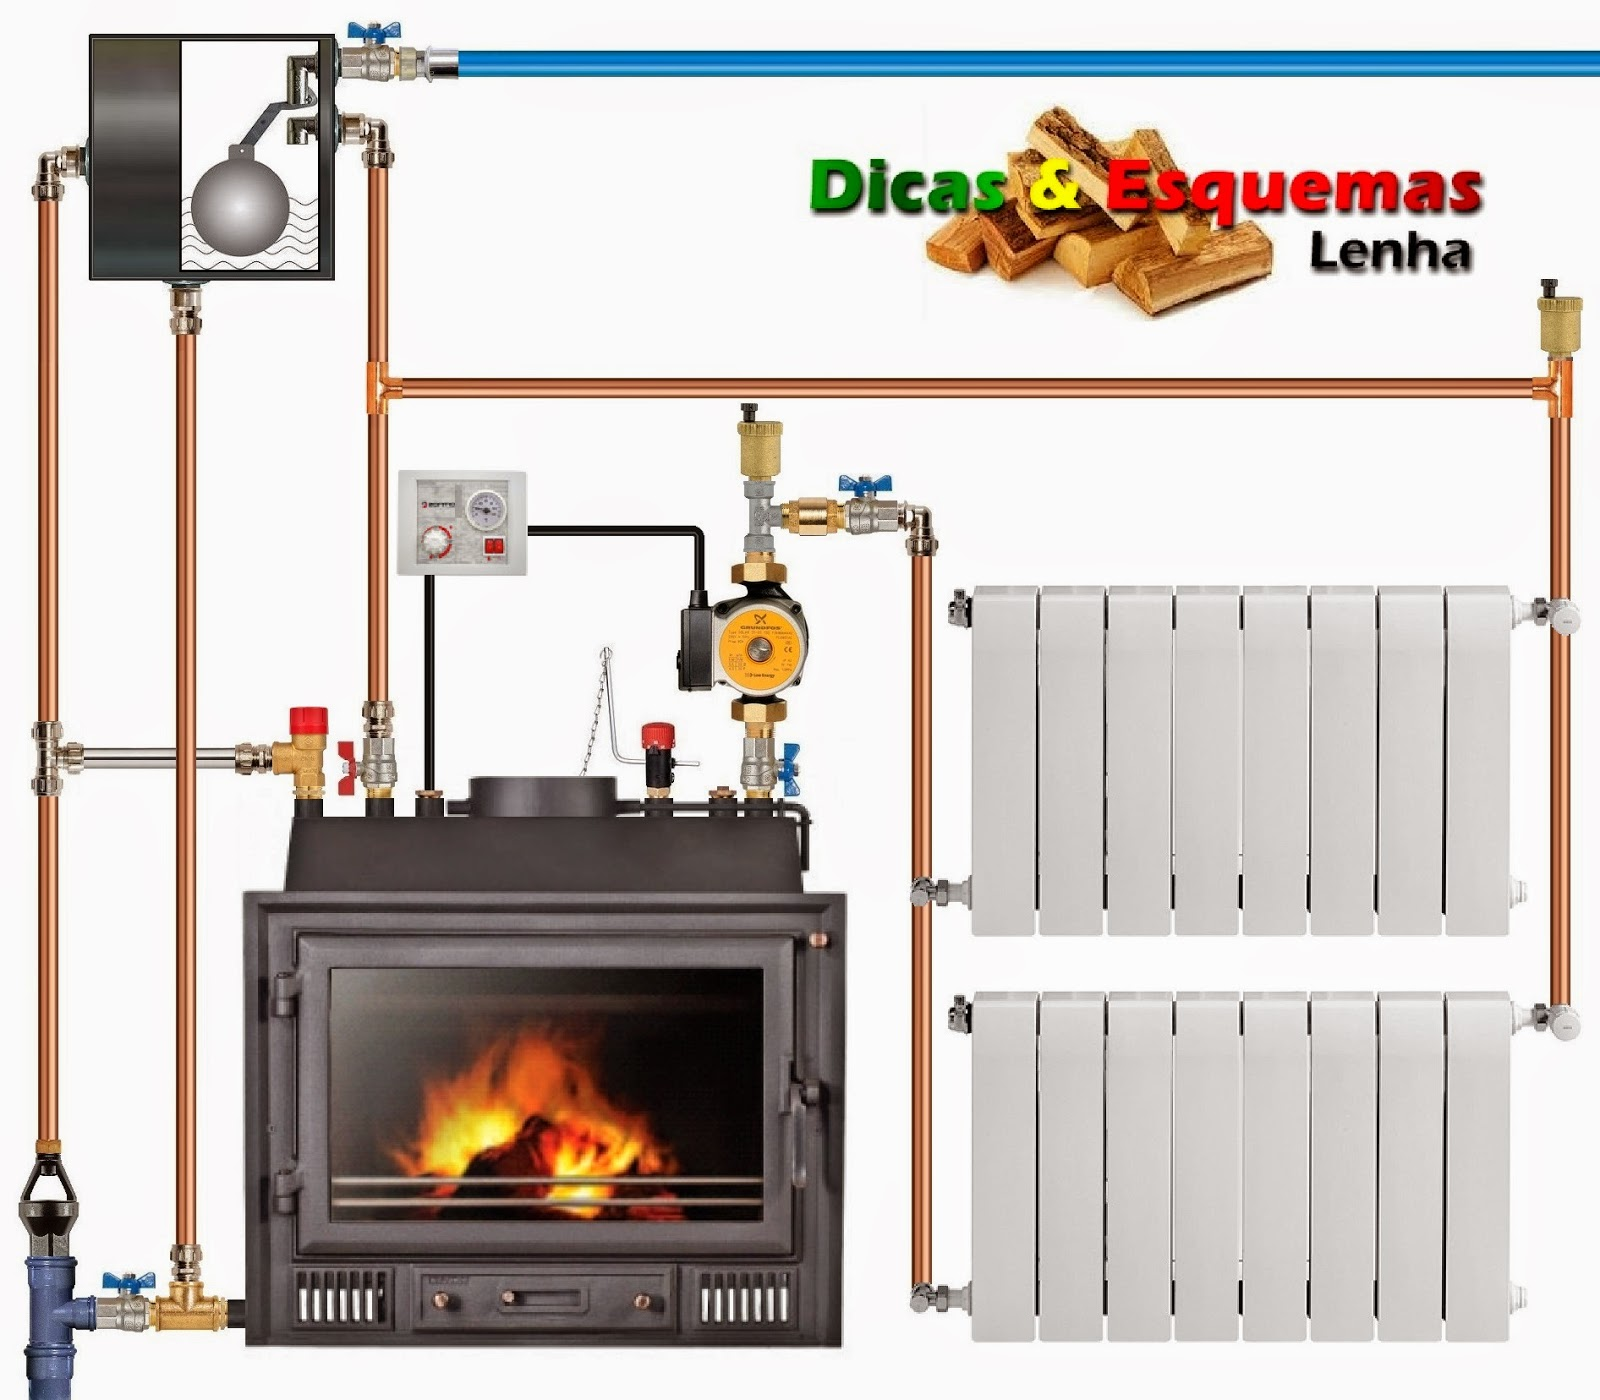 Circuito Aberto : Recuperador de calor a lenha: capitulo 7 circuito não pressurizado